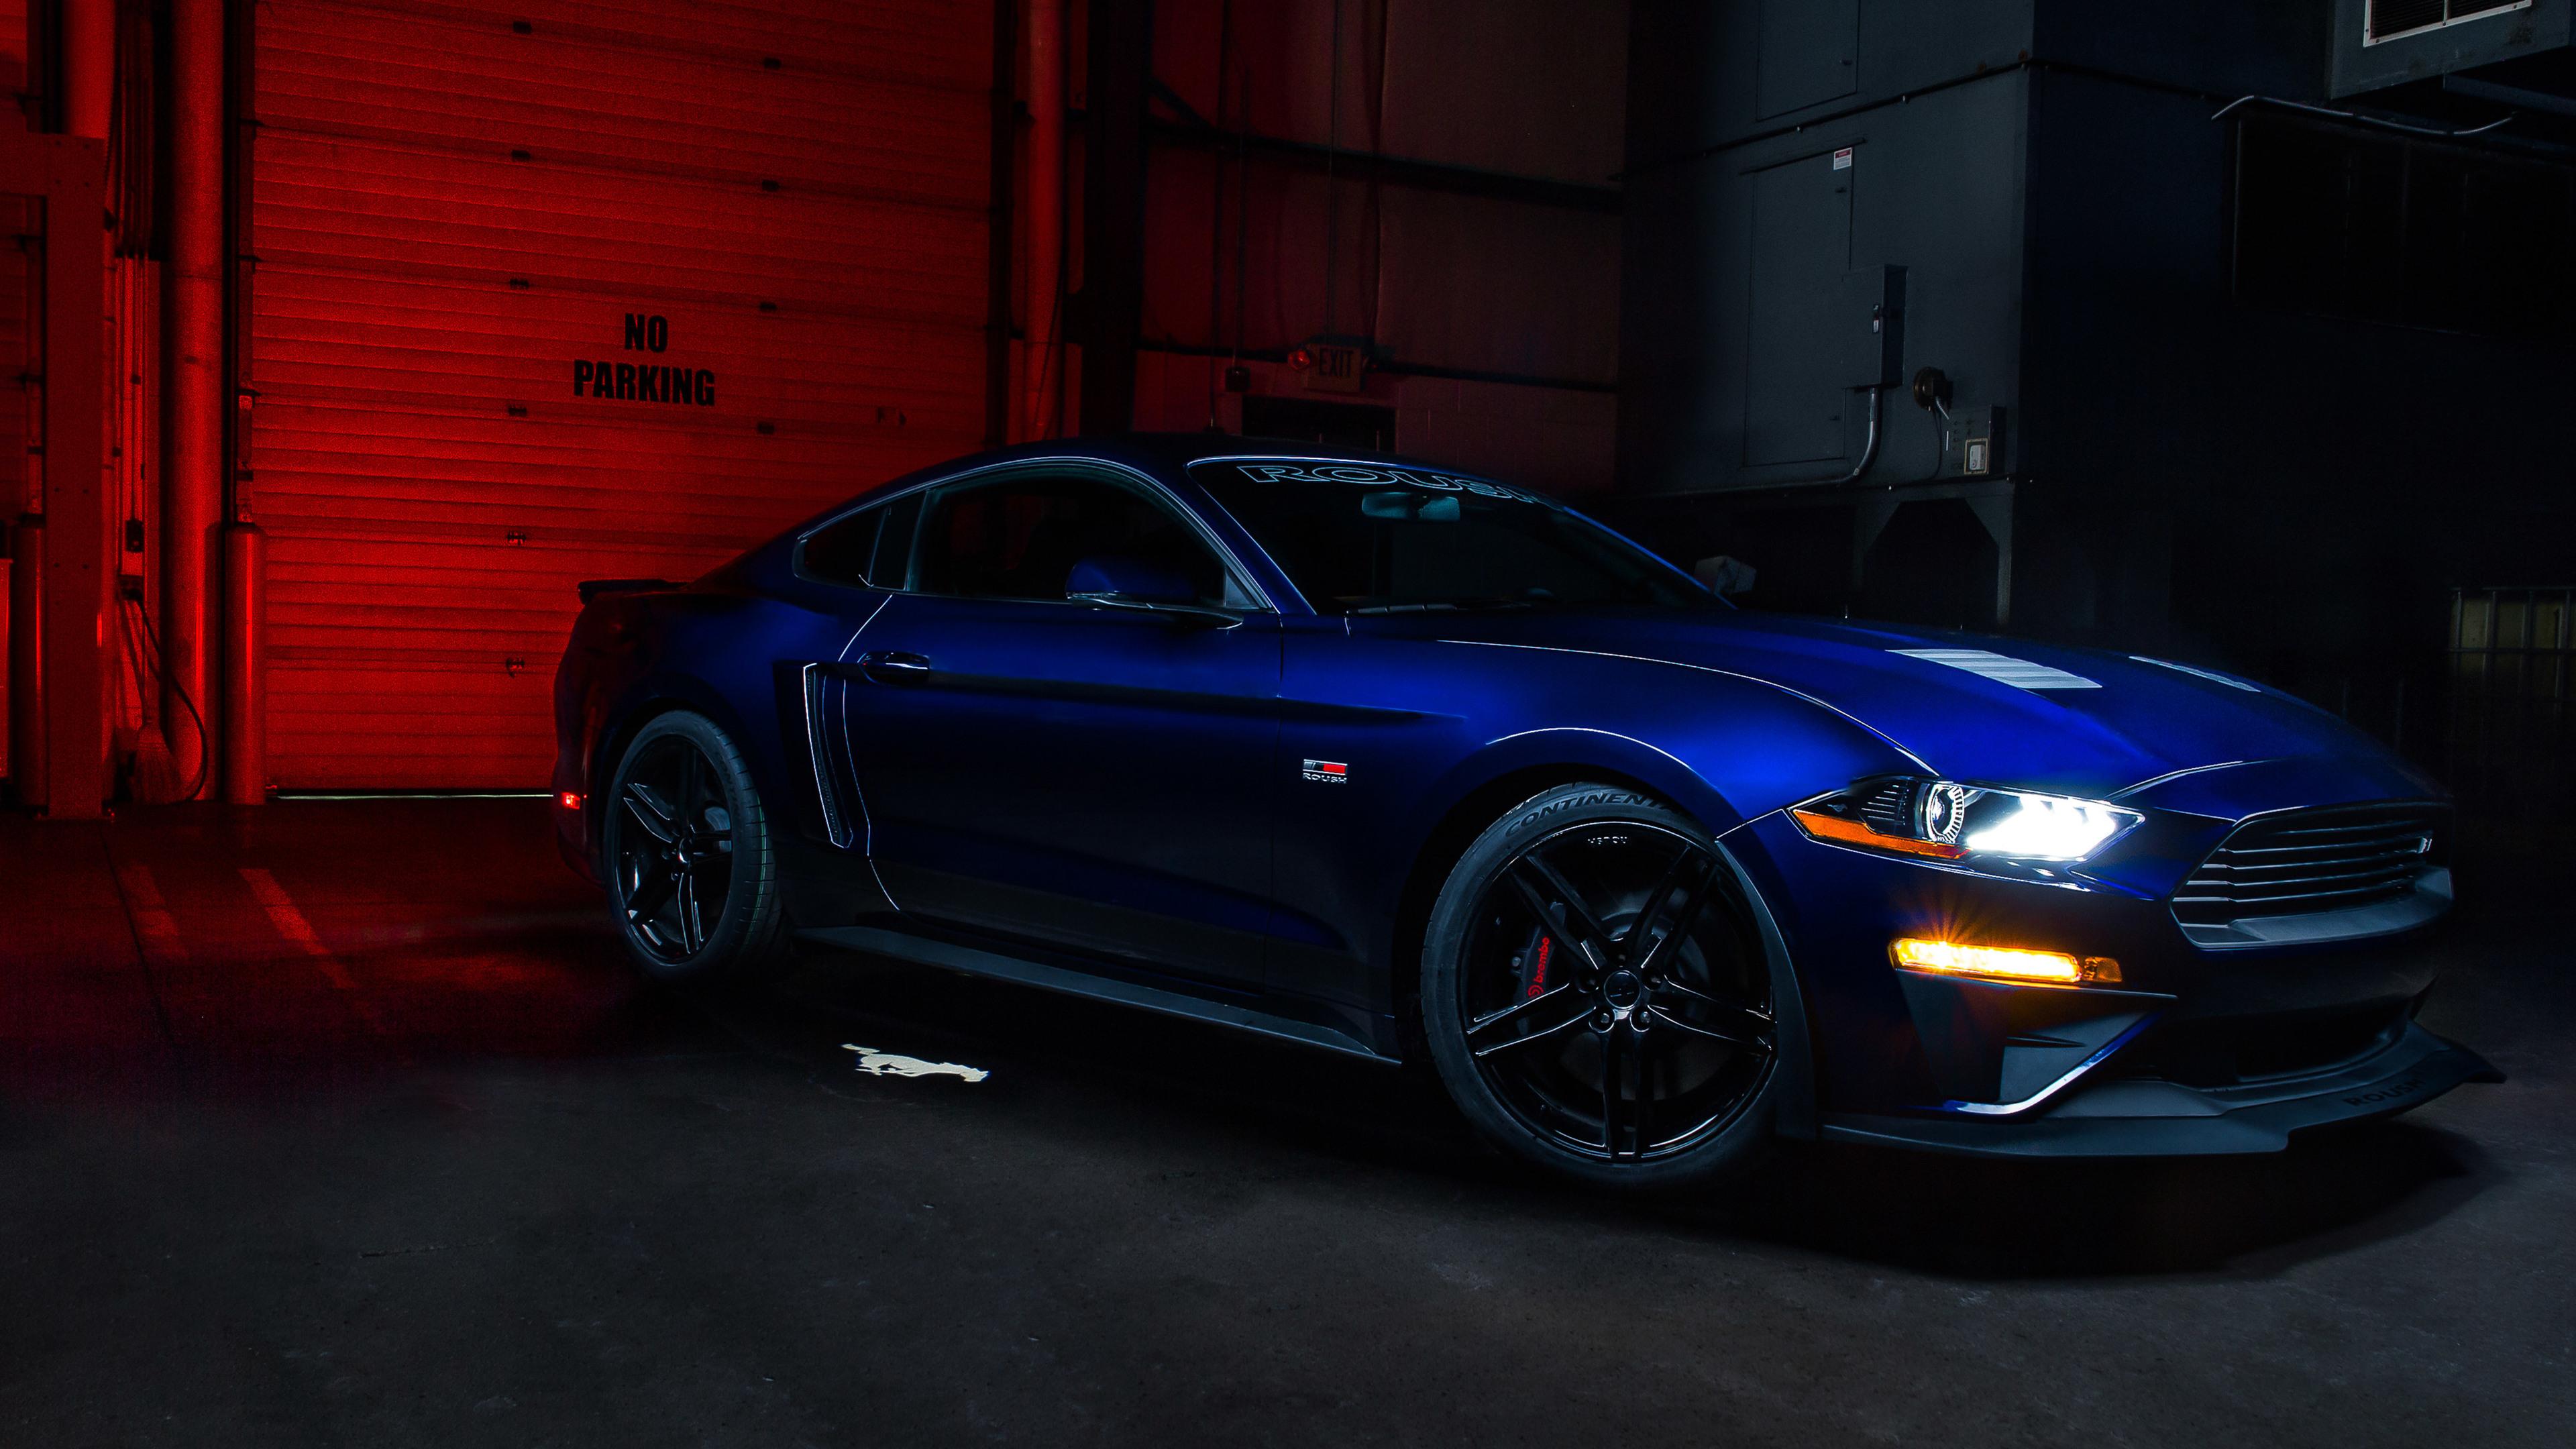 2018 roush rs2 blue car 1539110576 - 2018 Roush RS2 Blue Car - roush rs2 wallpapers, mustang wallpapers, hd-wallpapers, cars wallpapers, 4k-wallpapers, 2018 cars wallpapers